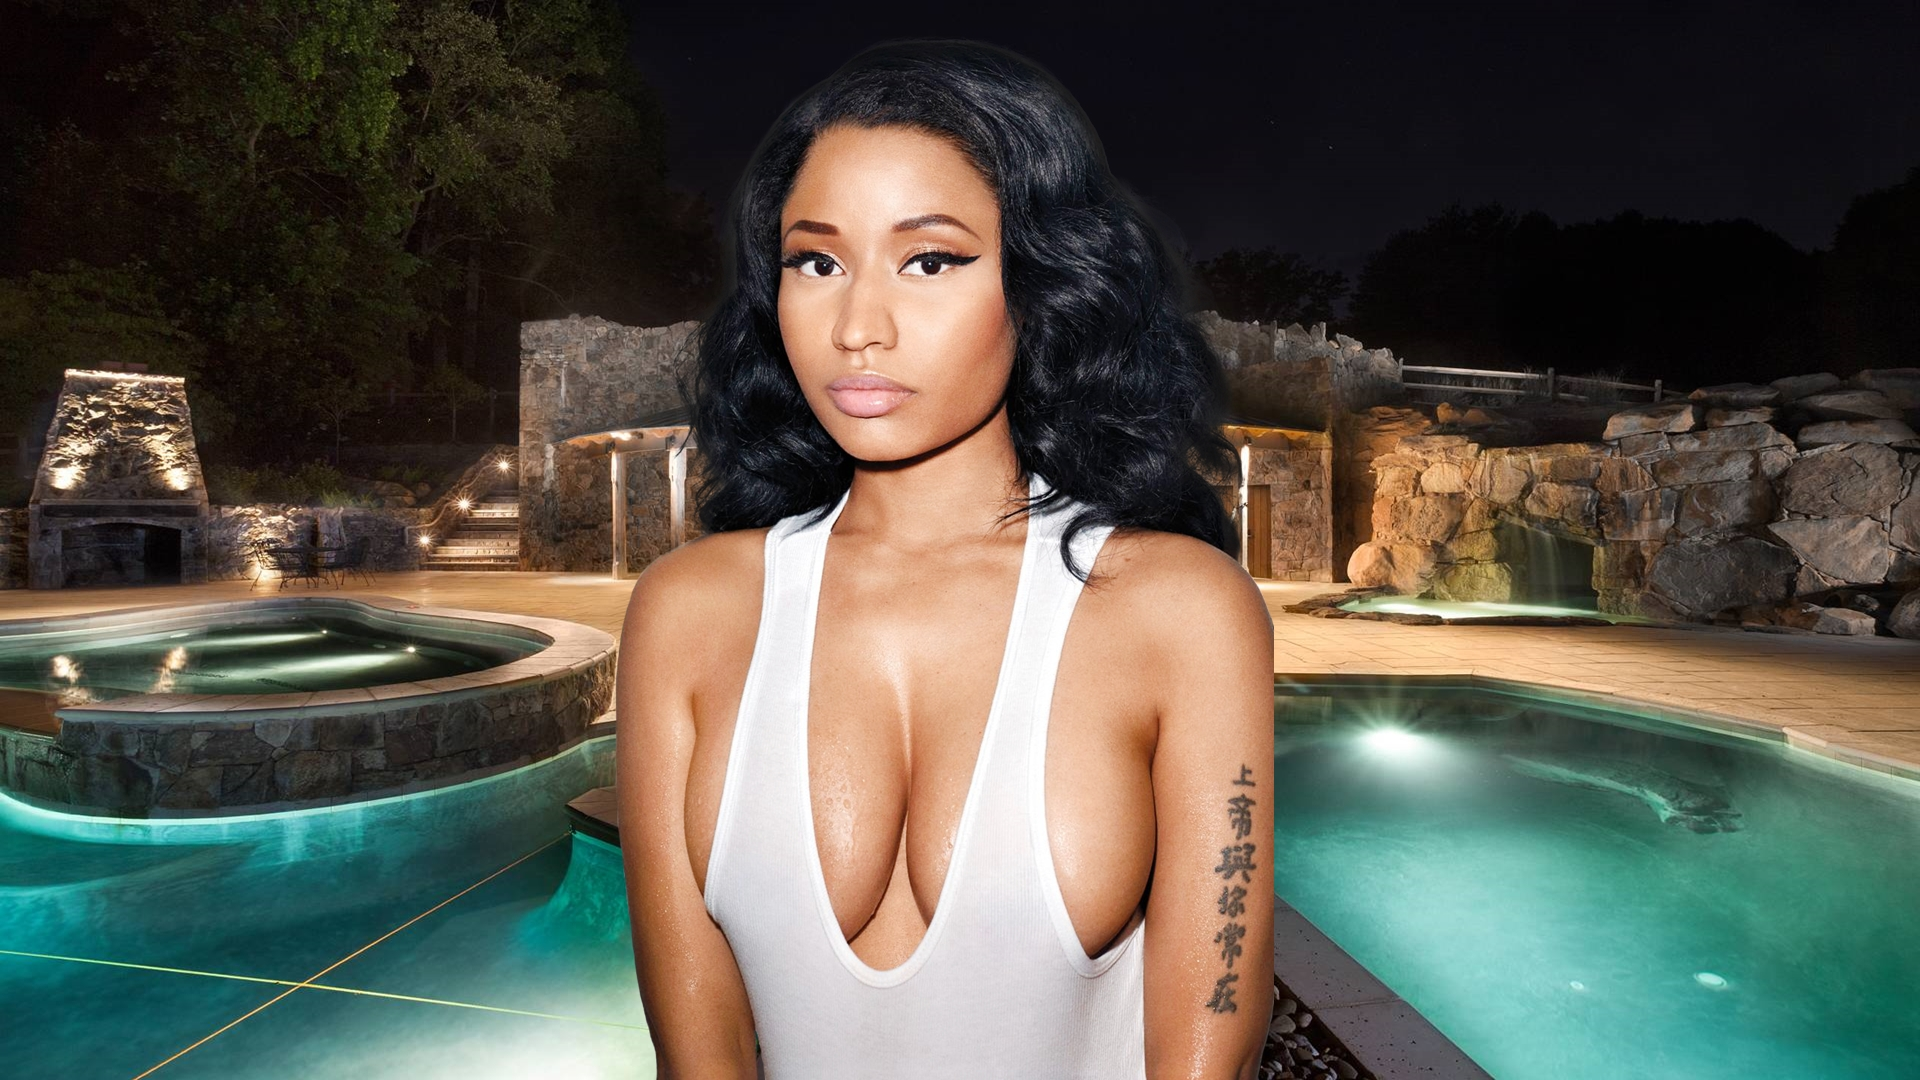 Nicki Minaj Wallpaper Hd By Maarcopngs On Deviantart